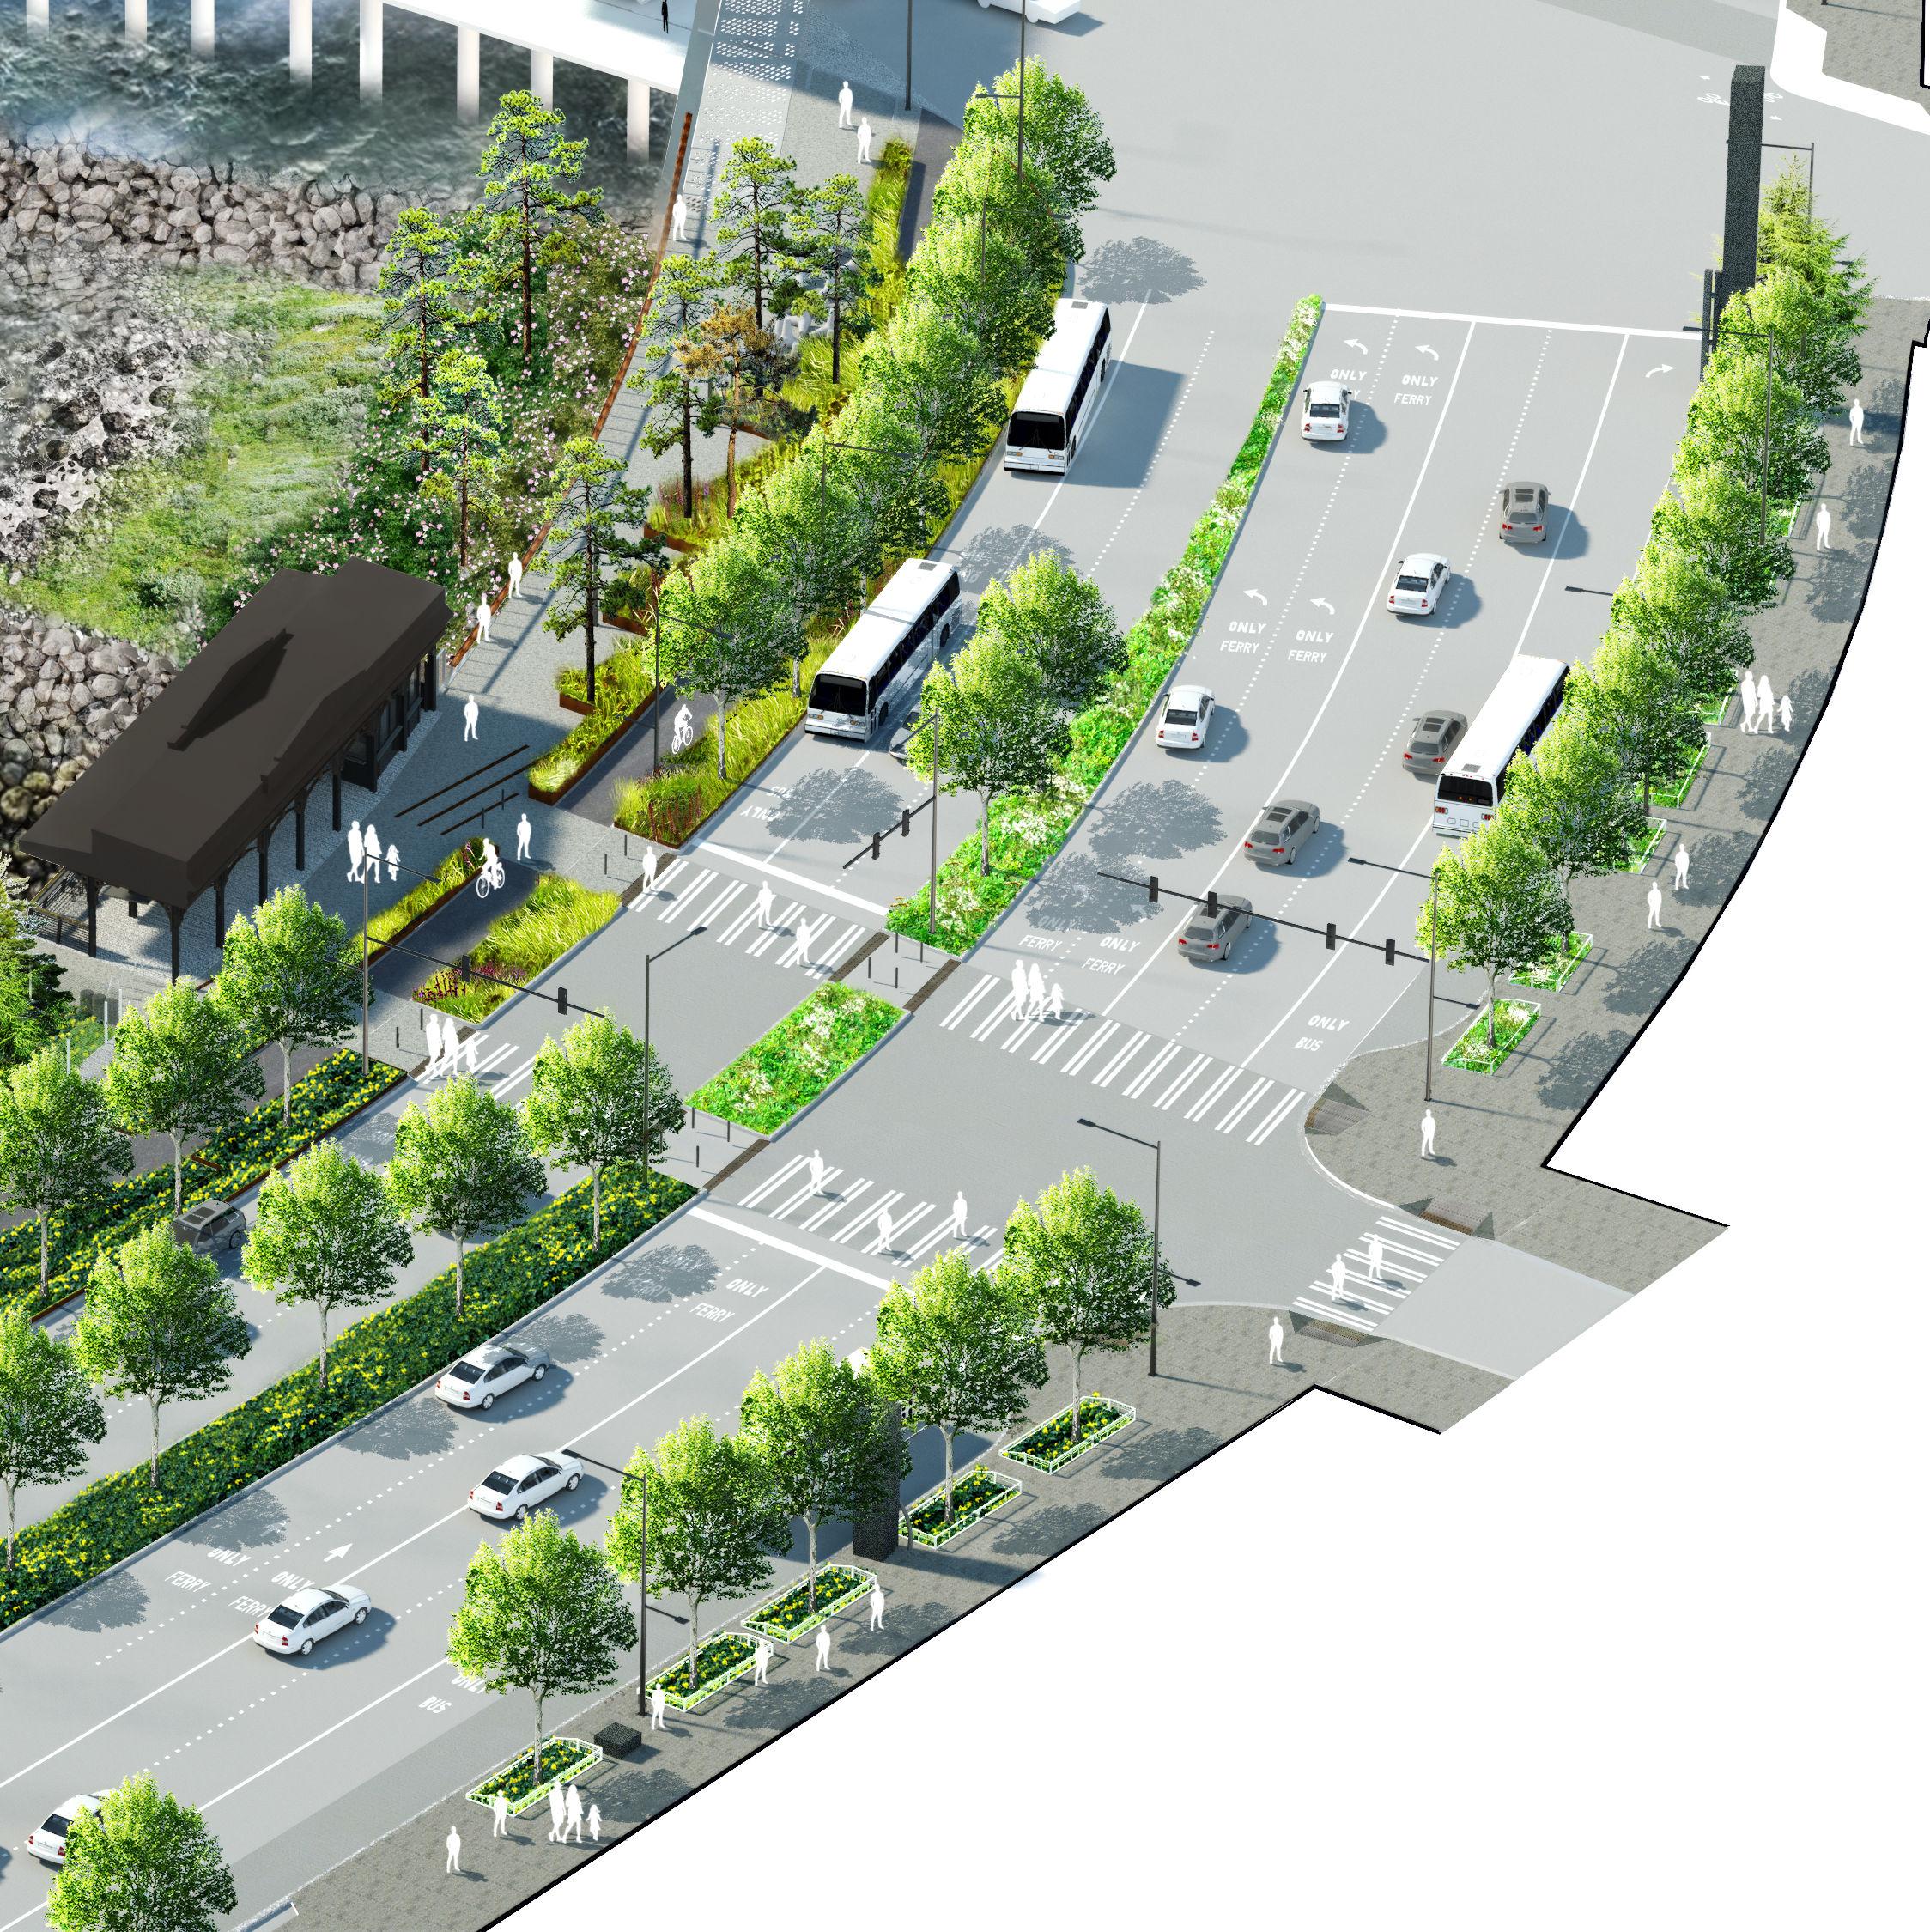 Wfs axon s washington street intersection uudmns